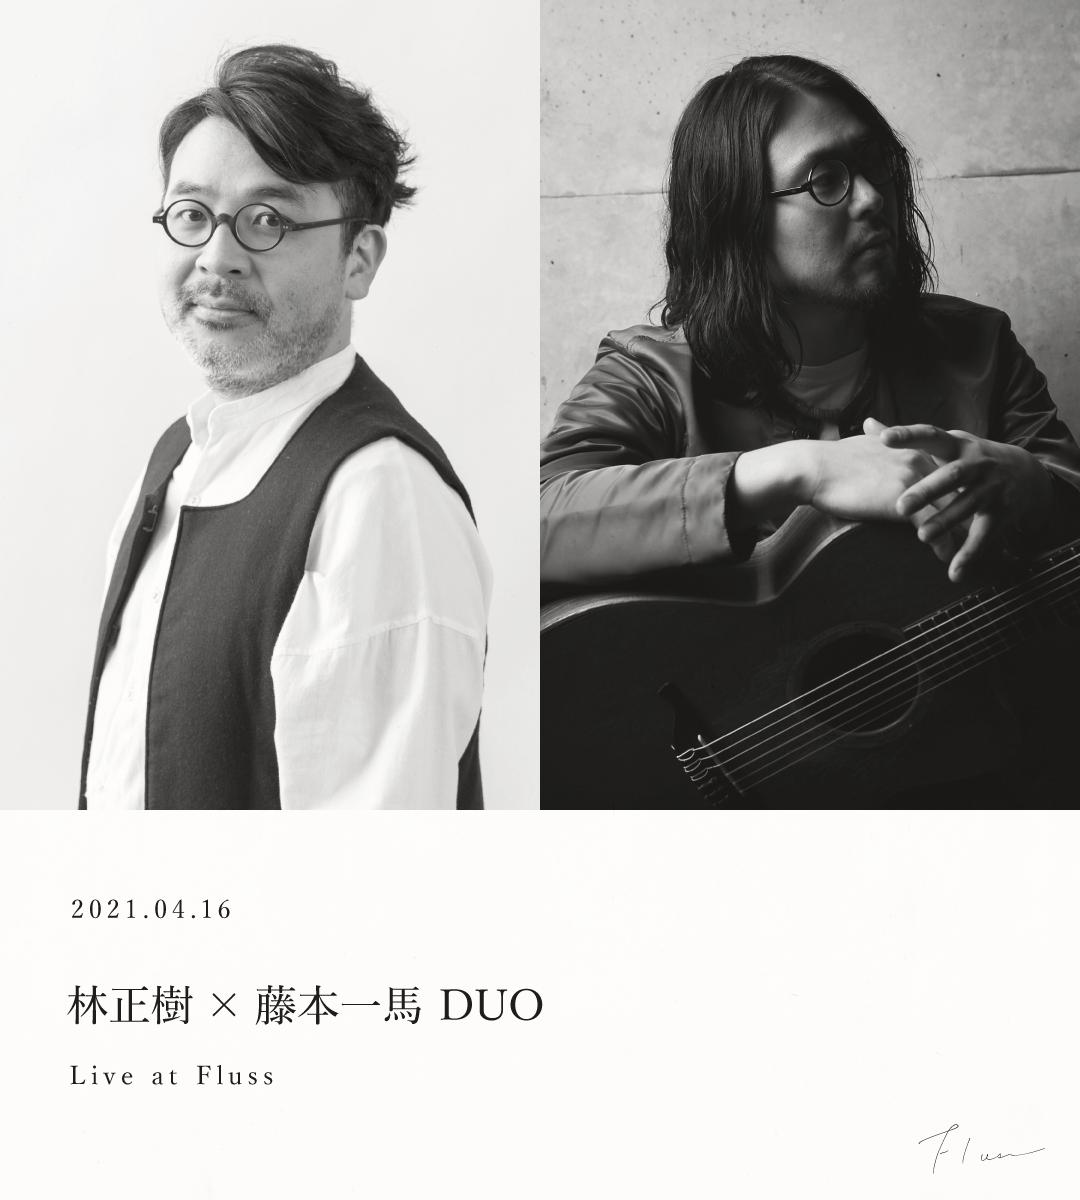 林正樹×藤本一馬 DUO Live at Fluss